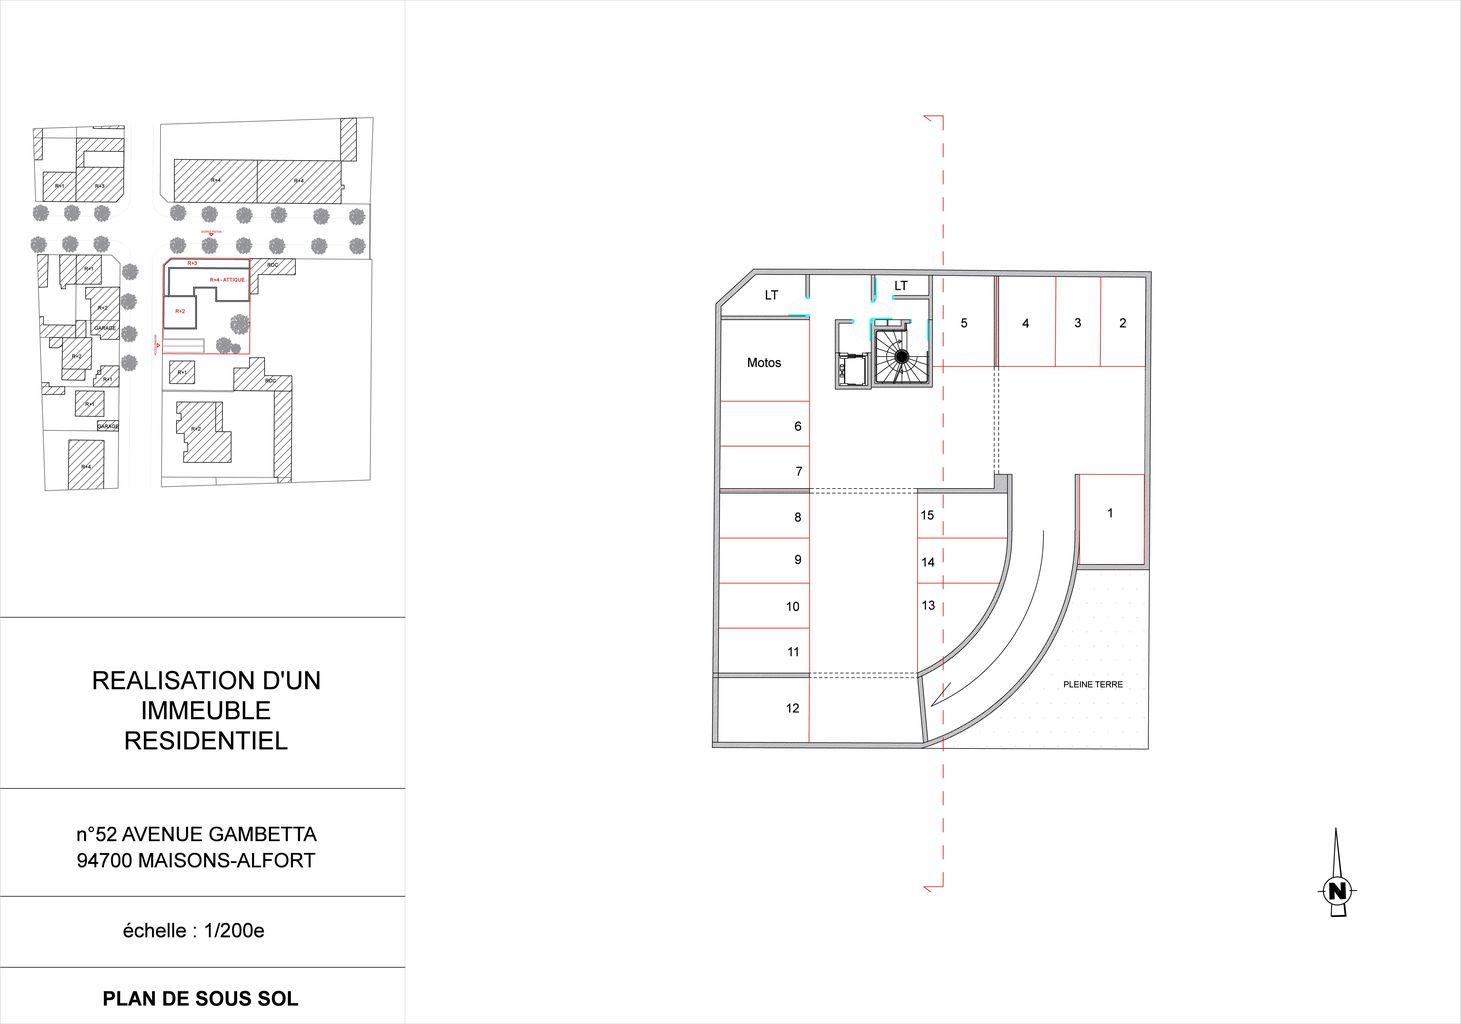 Plan parking sous sol dwg